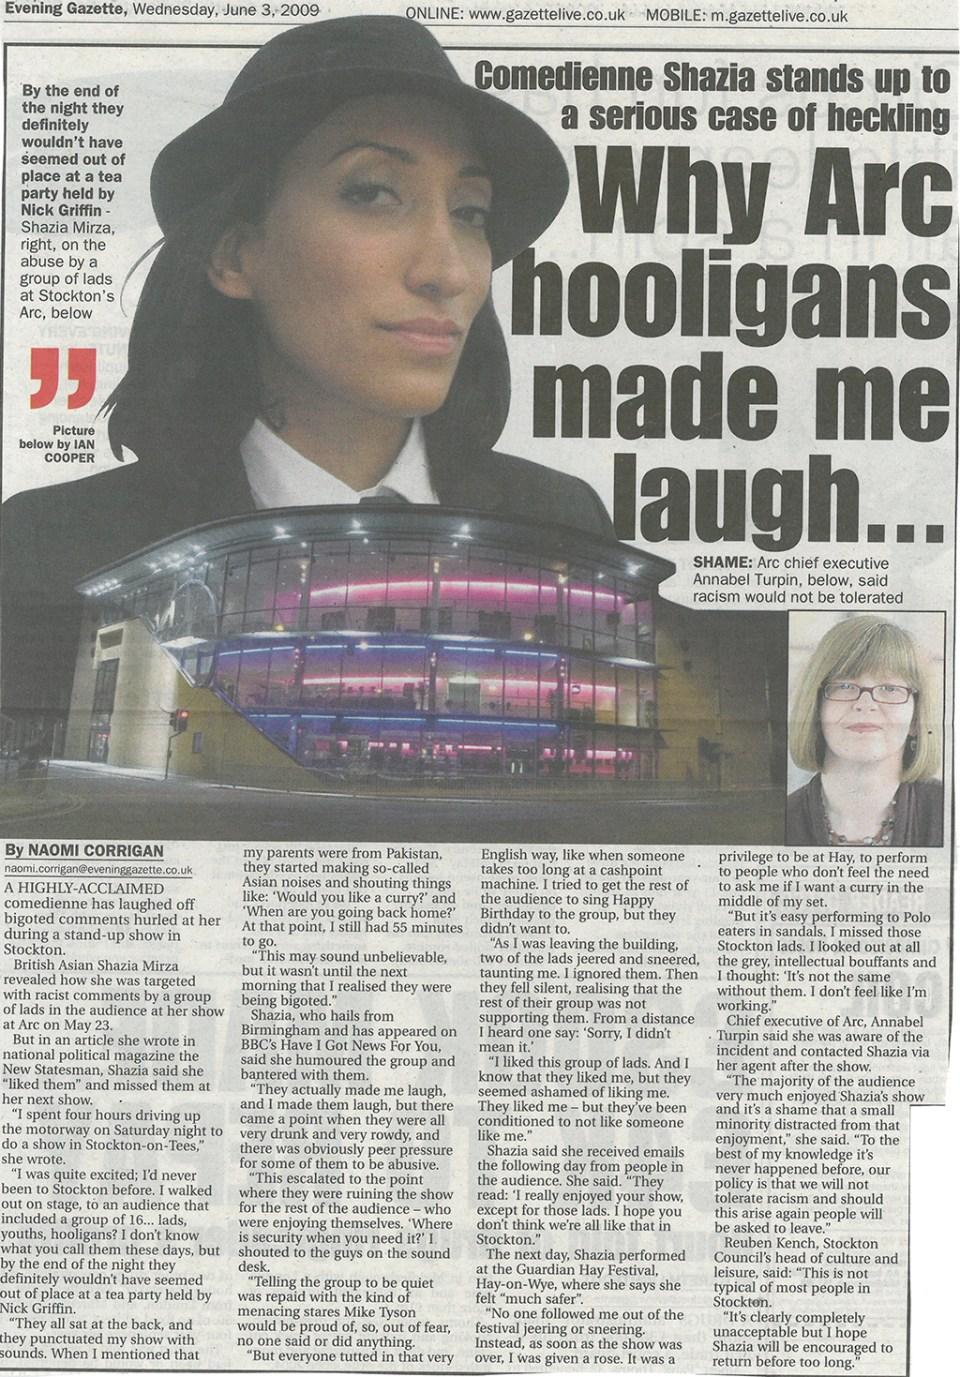 2009-06-03, Evening Gazette